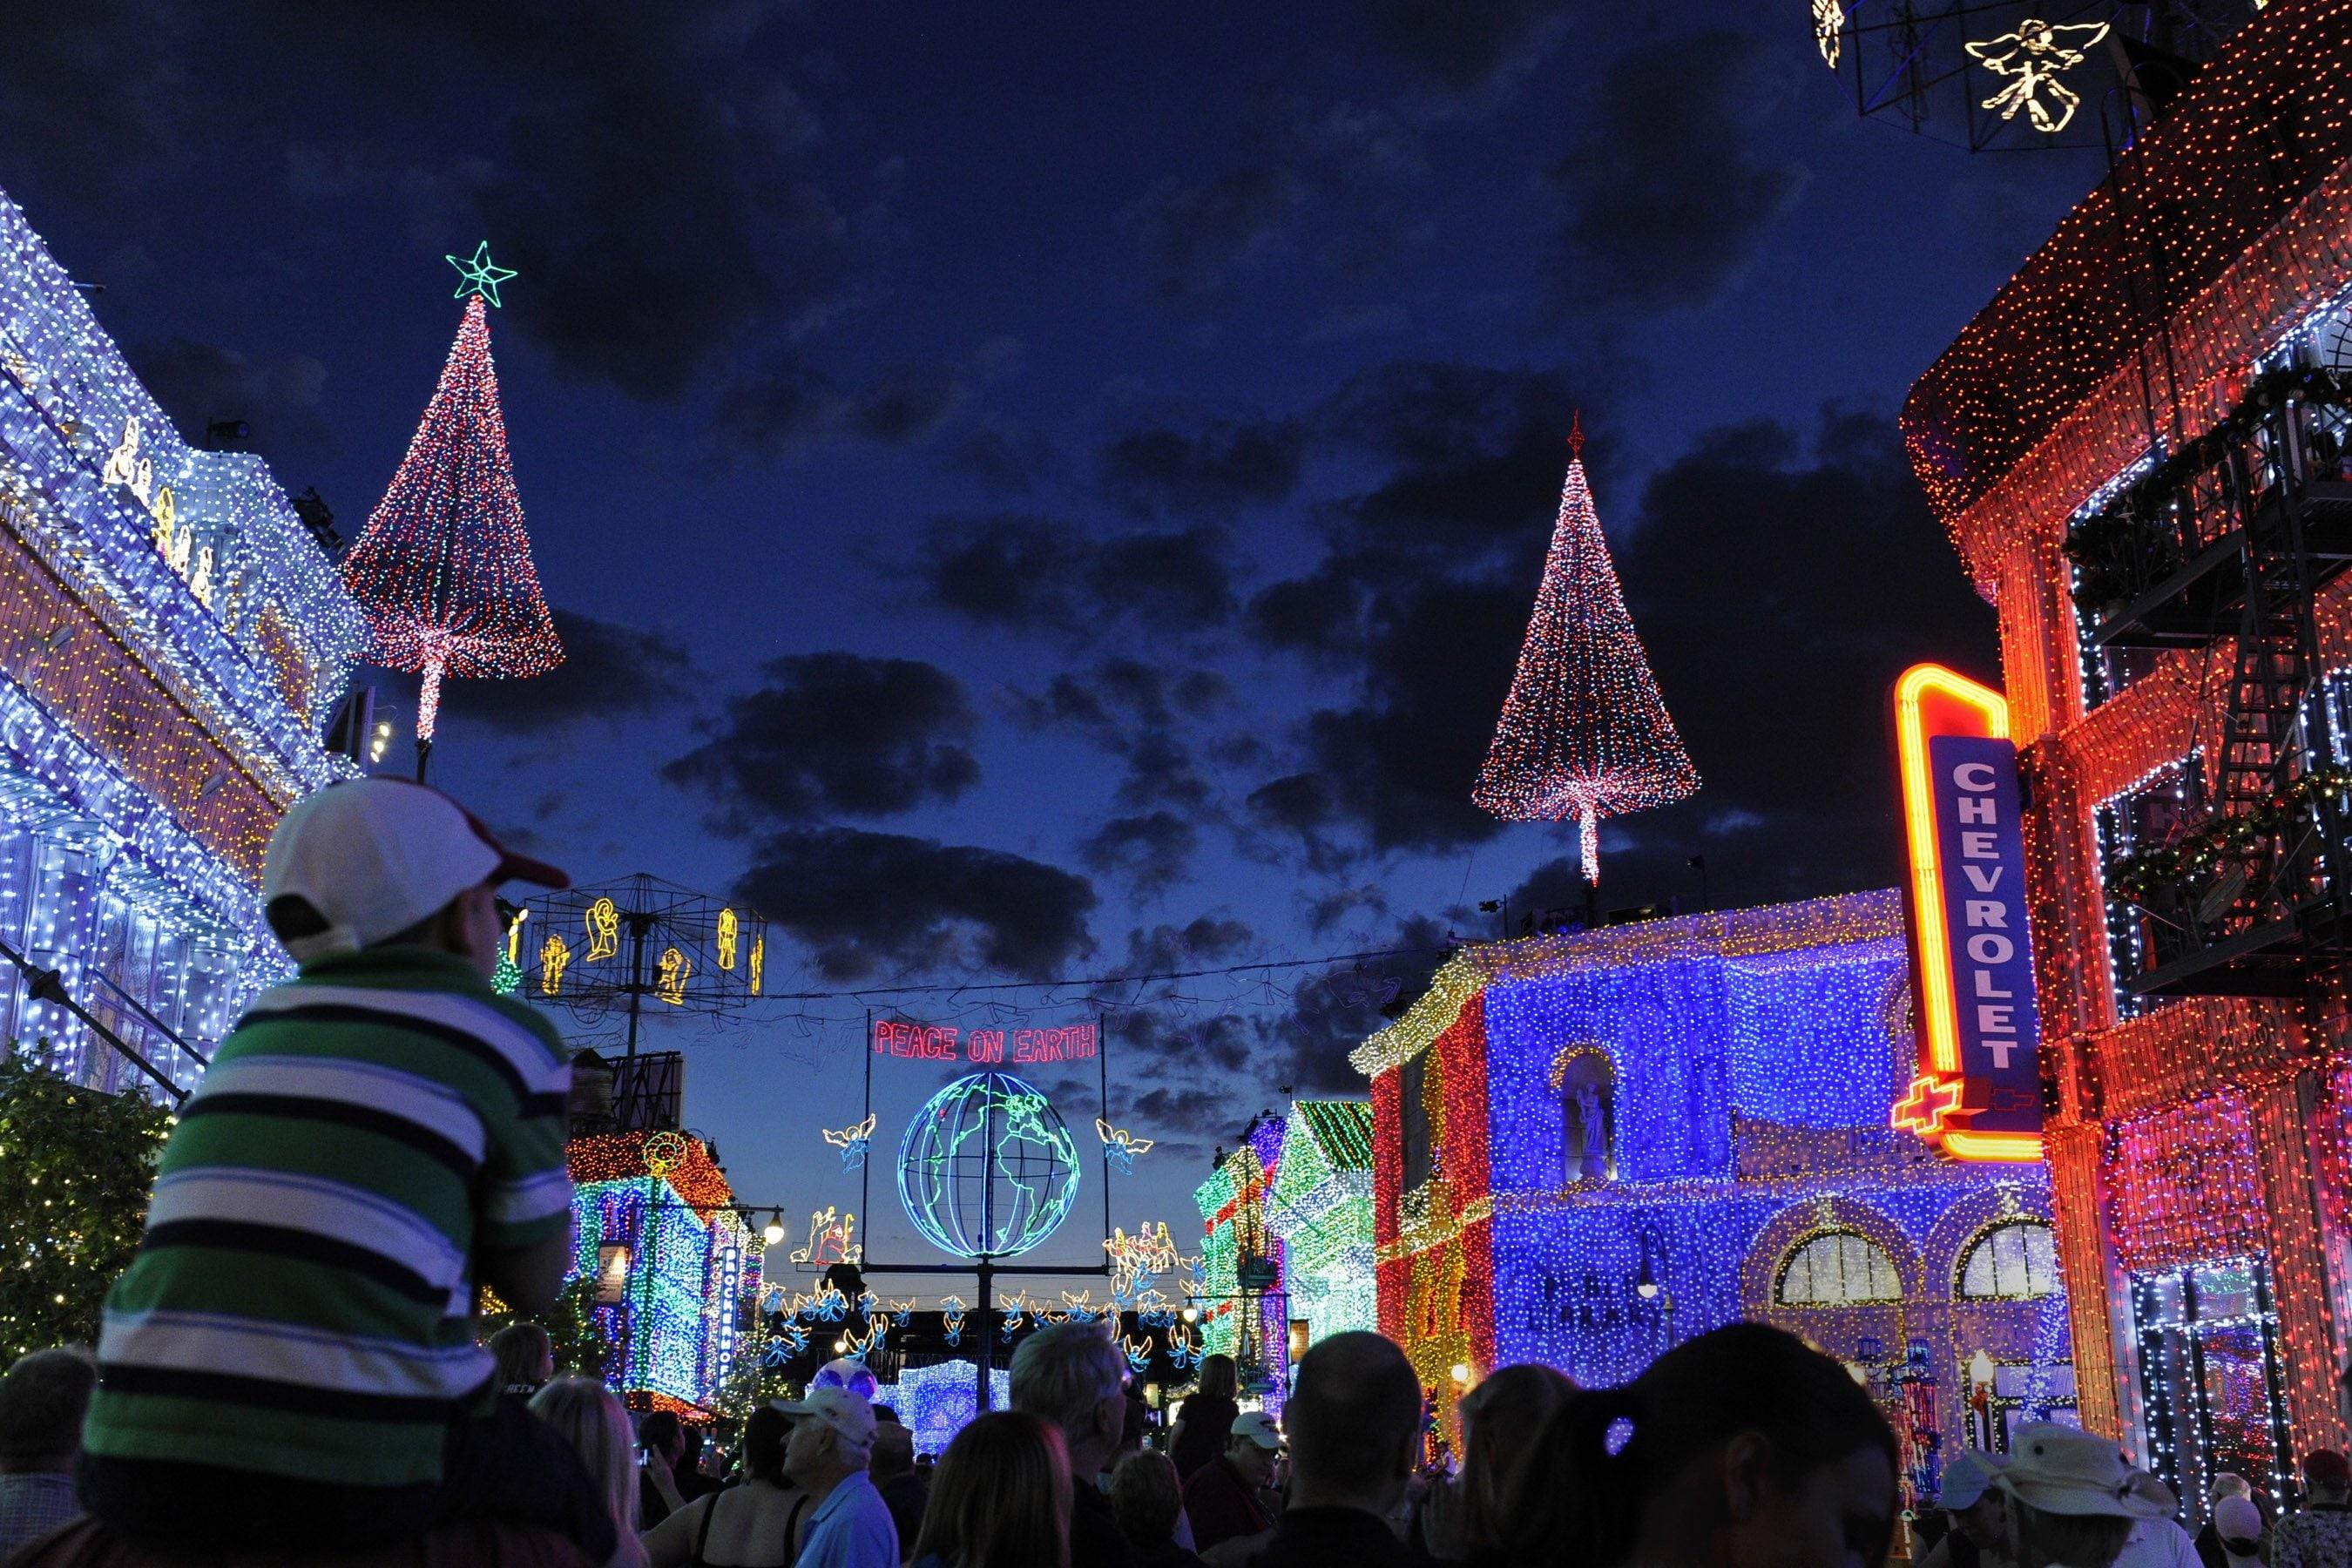 ofl872512 - Disney World Christmas Lights